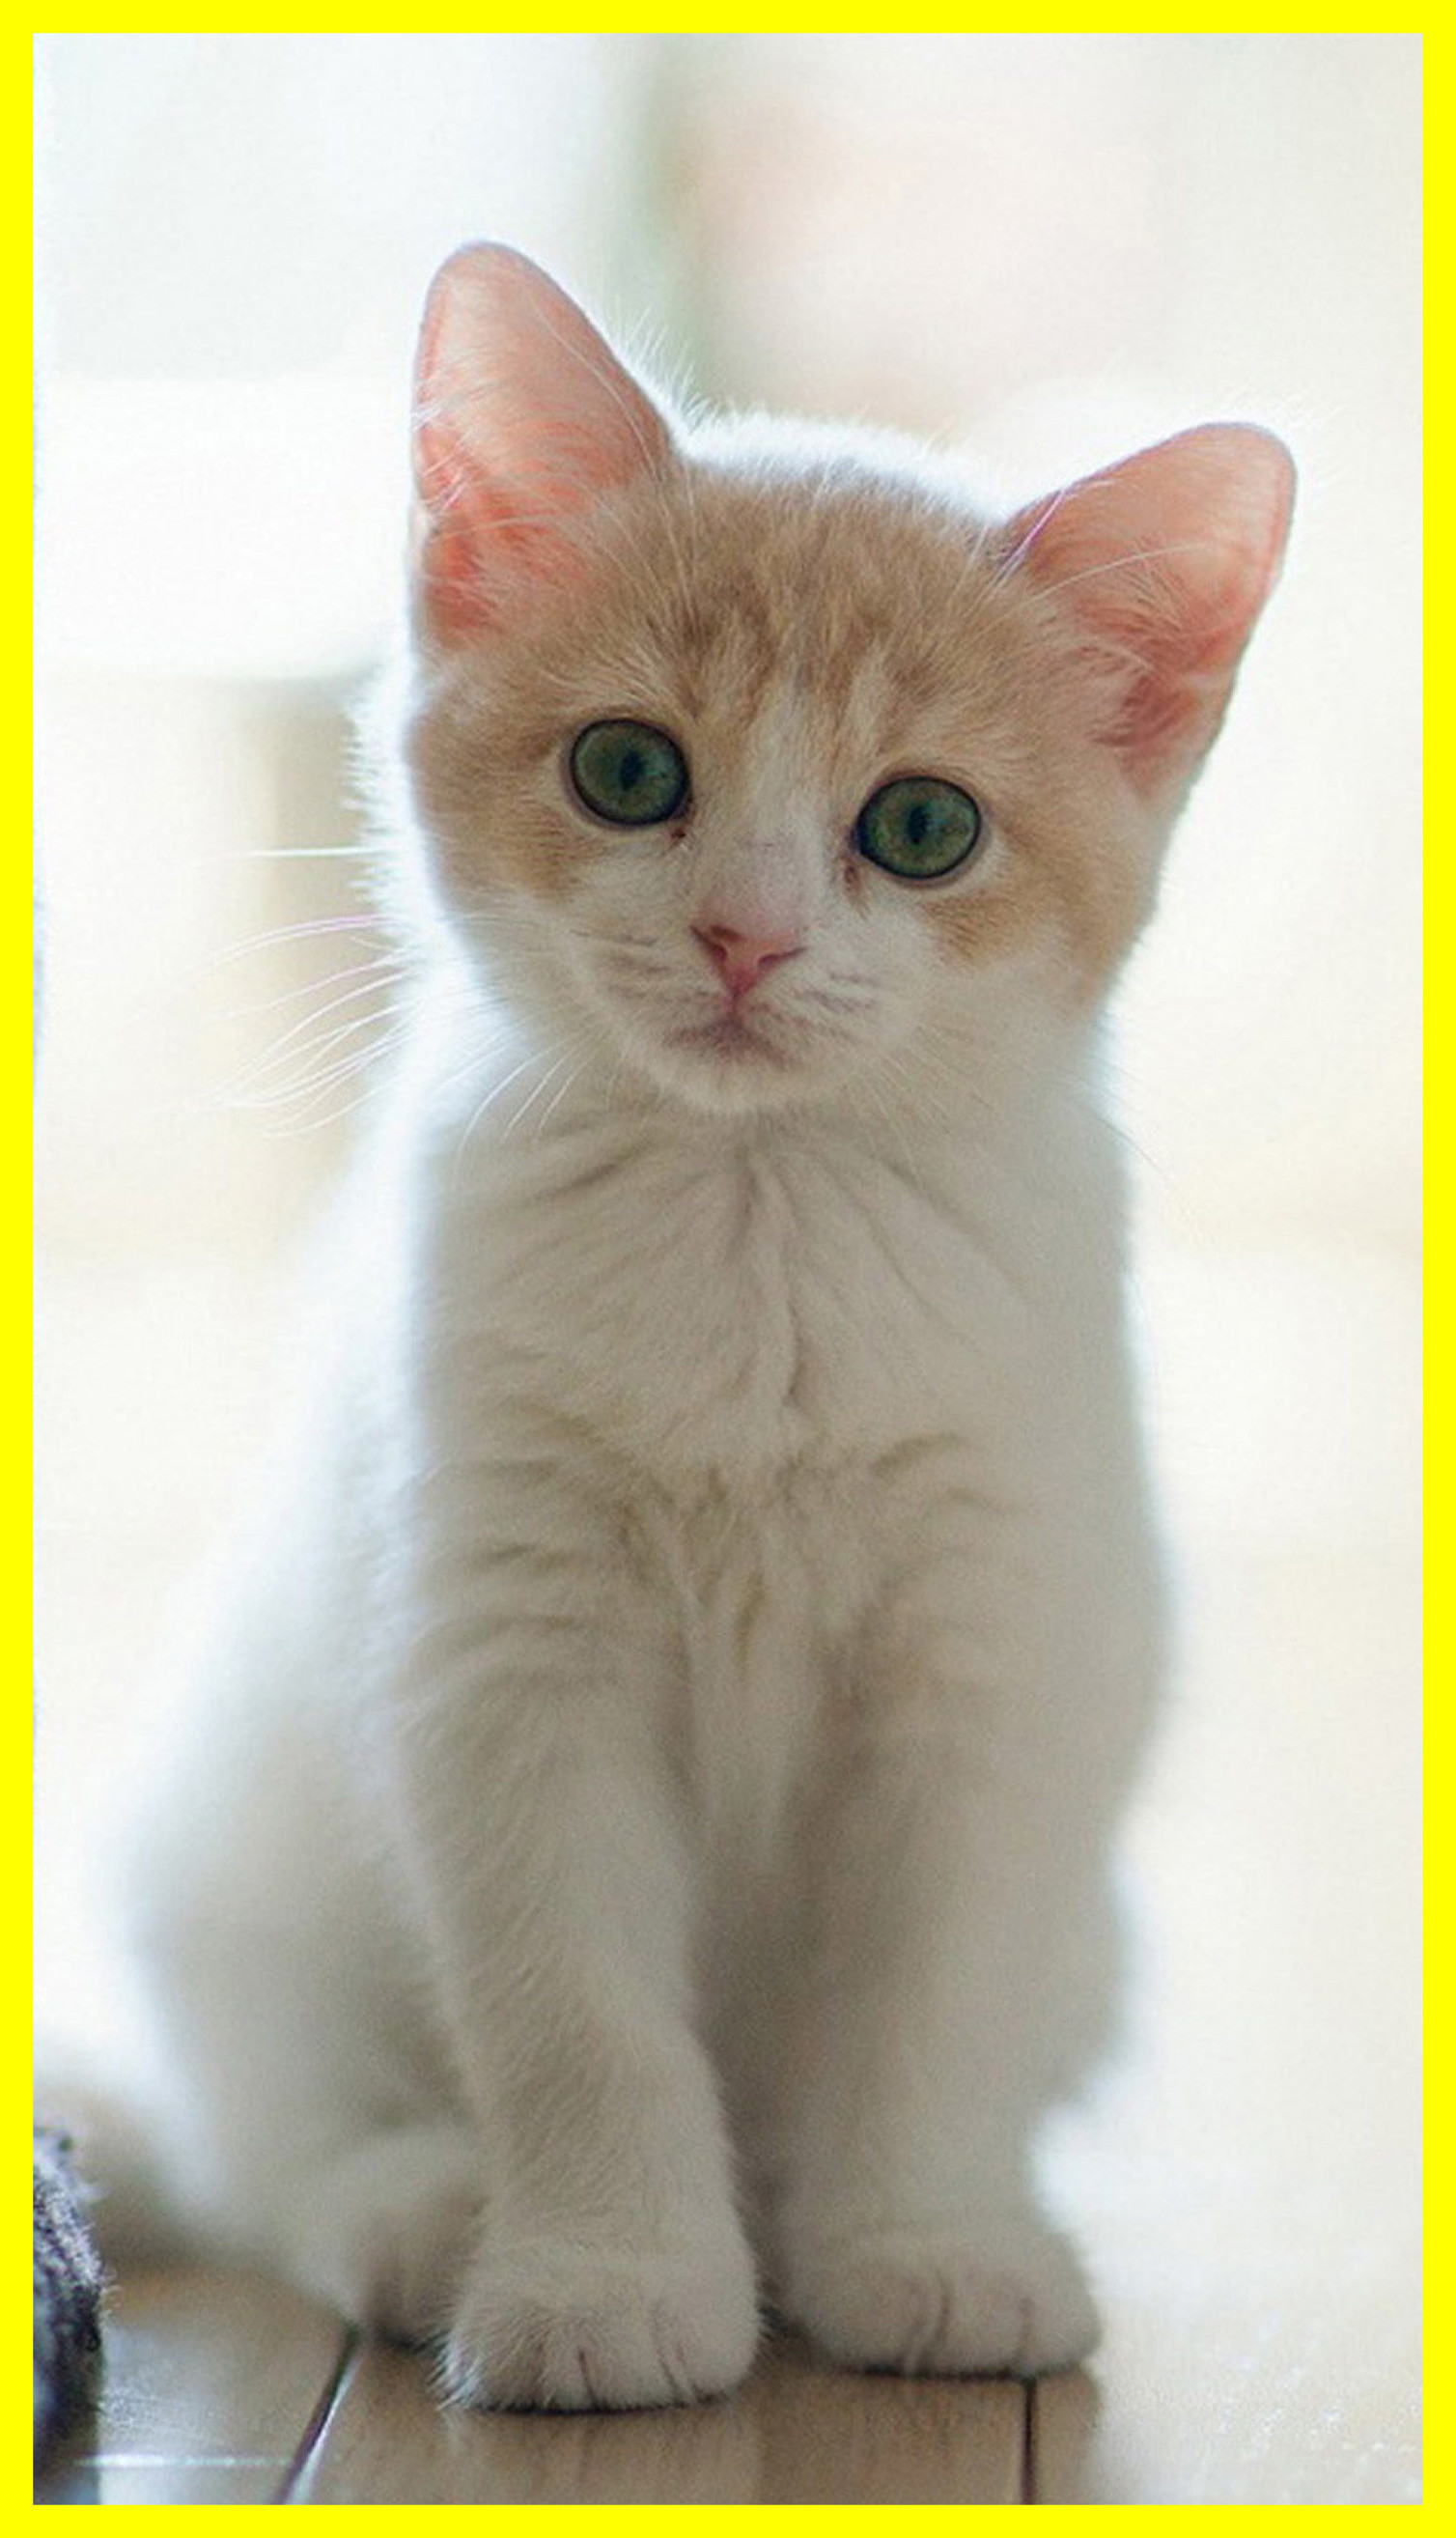 Res: 1508x2628, Cute Cat Wallpaper Cute Galaxy Cat Wallpaper Stunning Cute Hd For Galaxy  Pic Cat Wallpaper Trends